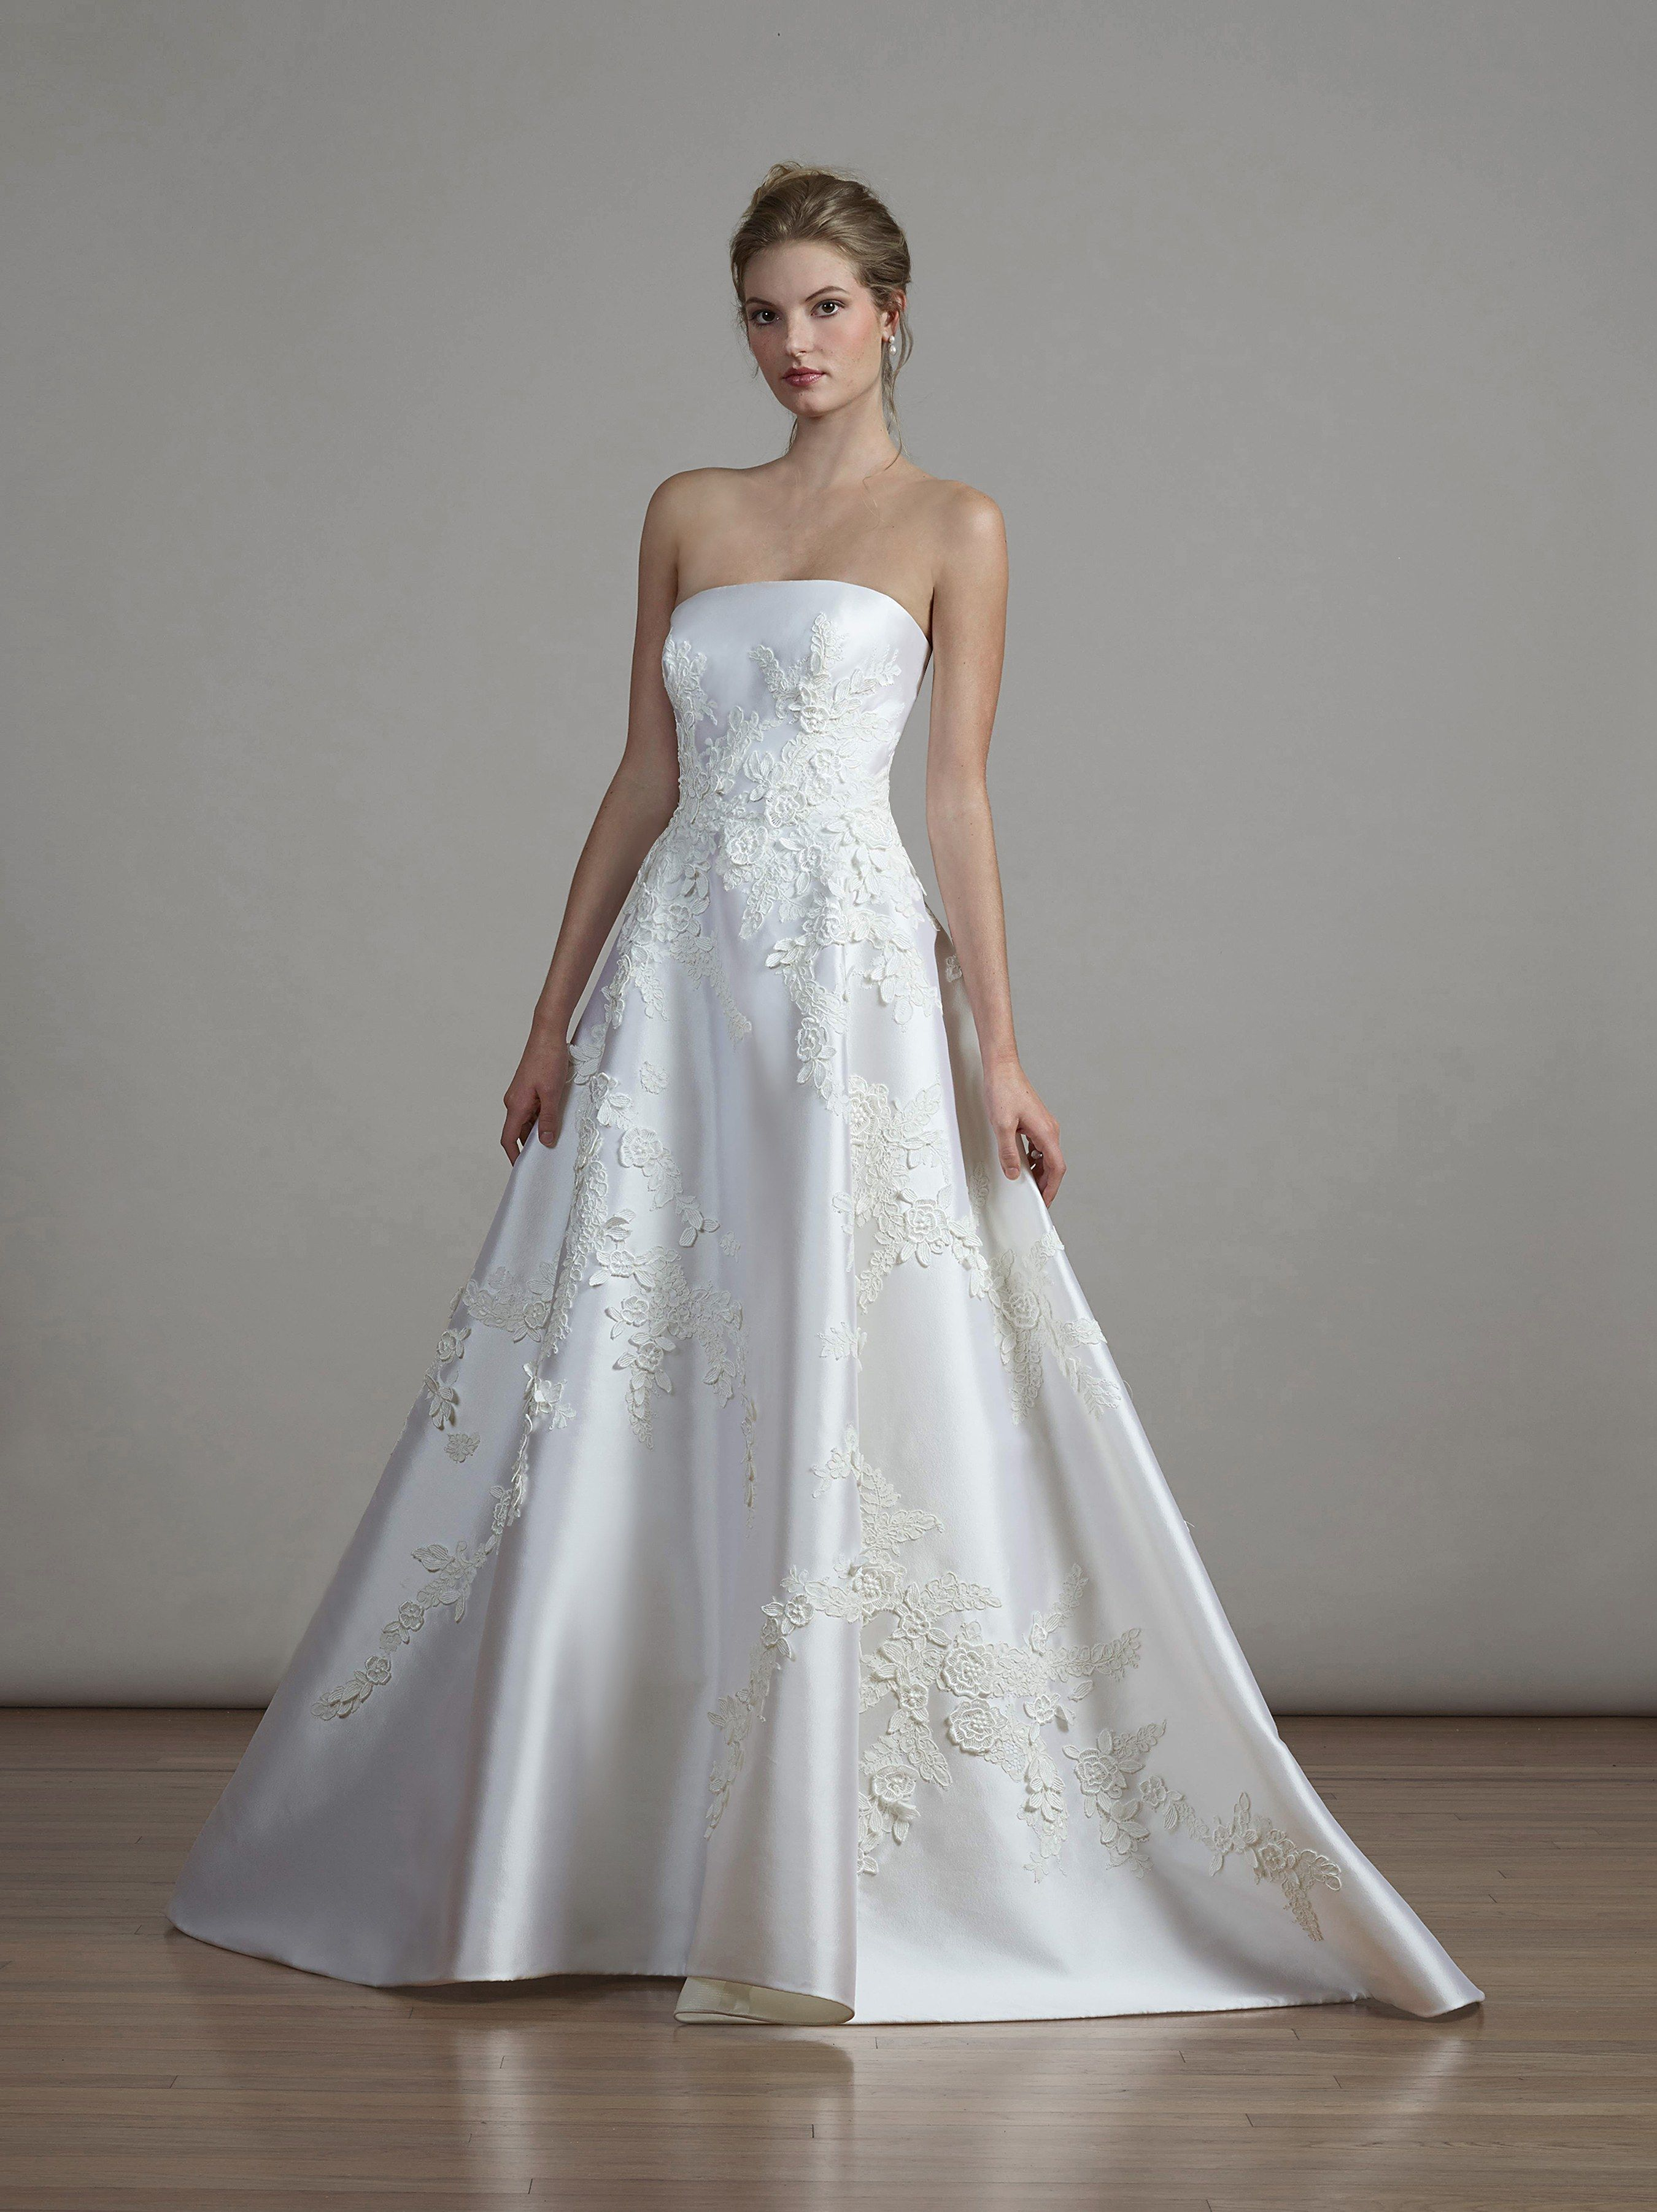 Liancarlo bridal wedding dress collection spring 2018 brides liancarlo bridal wedding dress collection spring 2018 brides junglespirit Choice Image